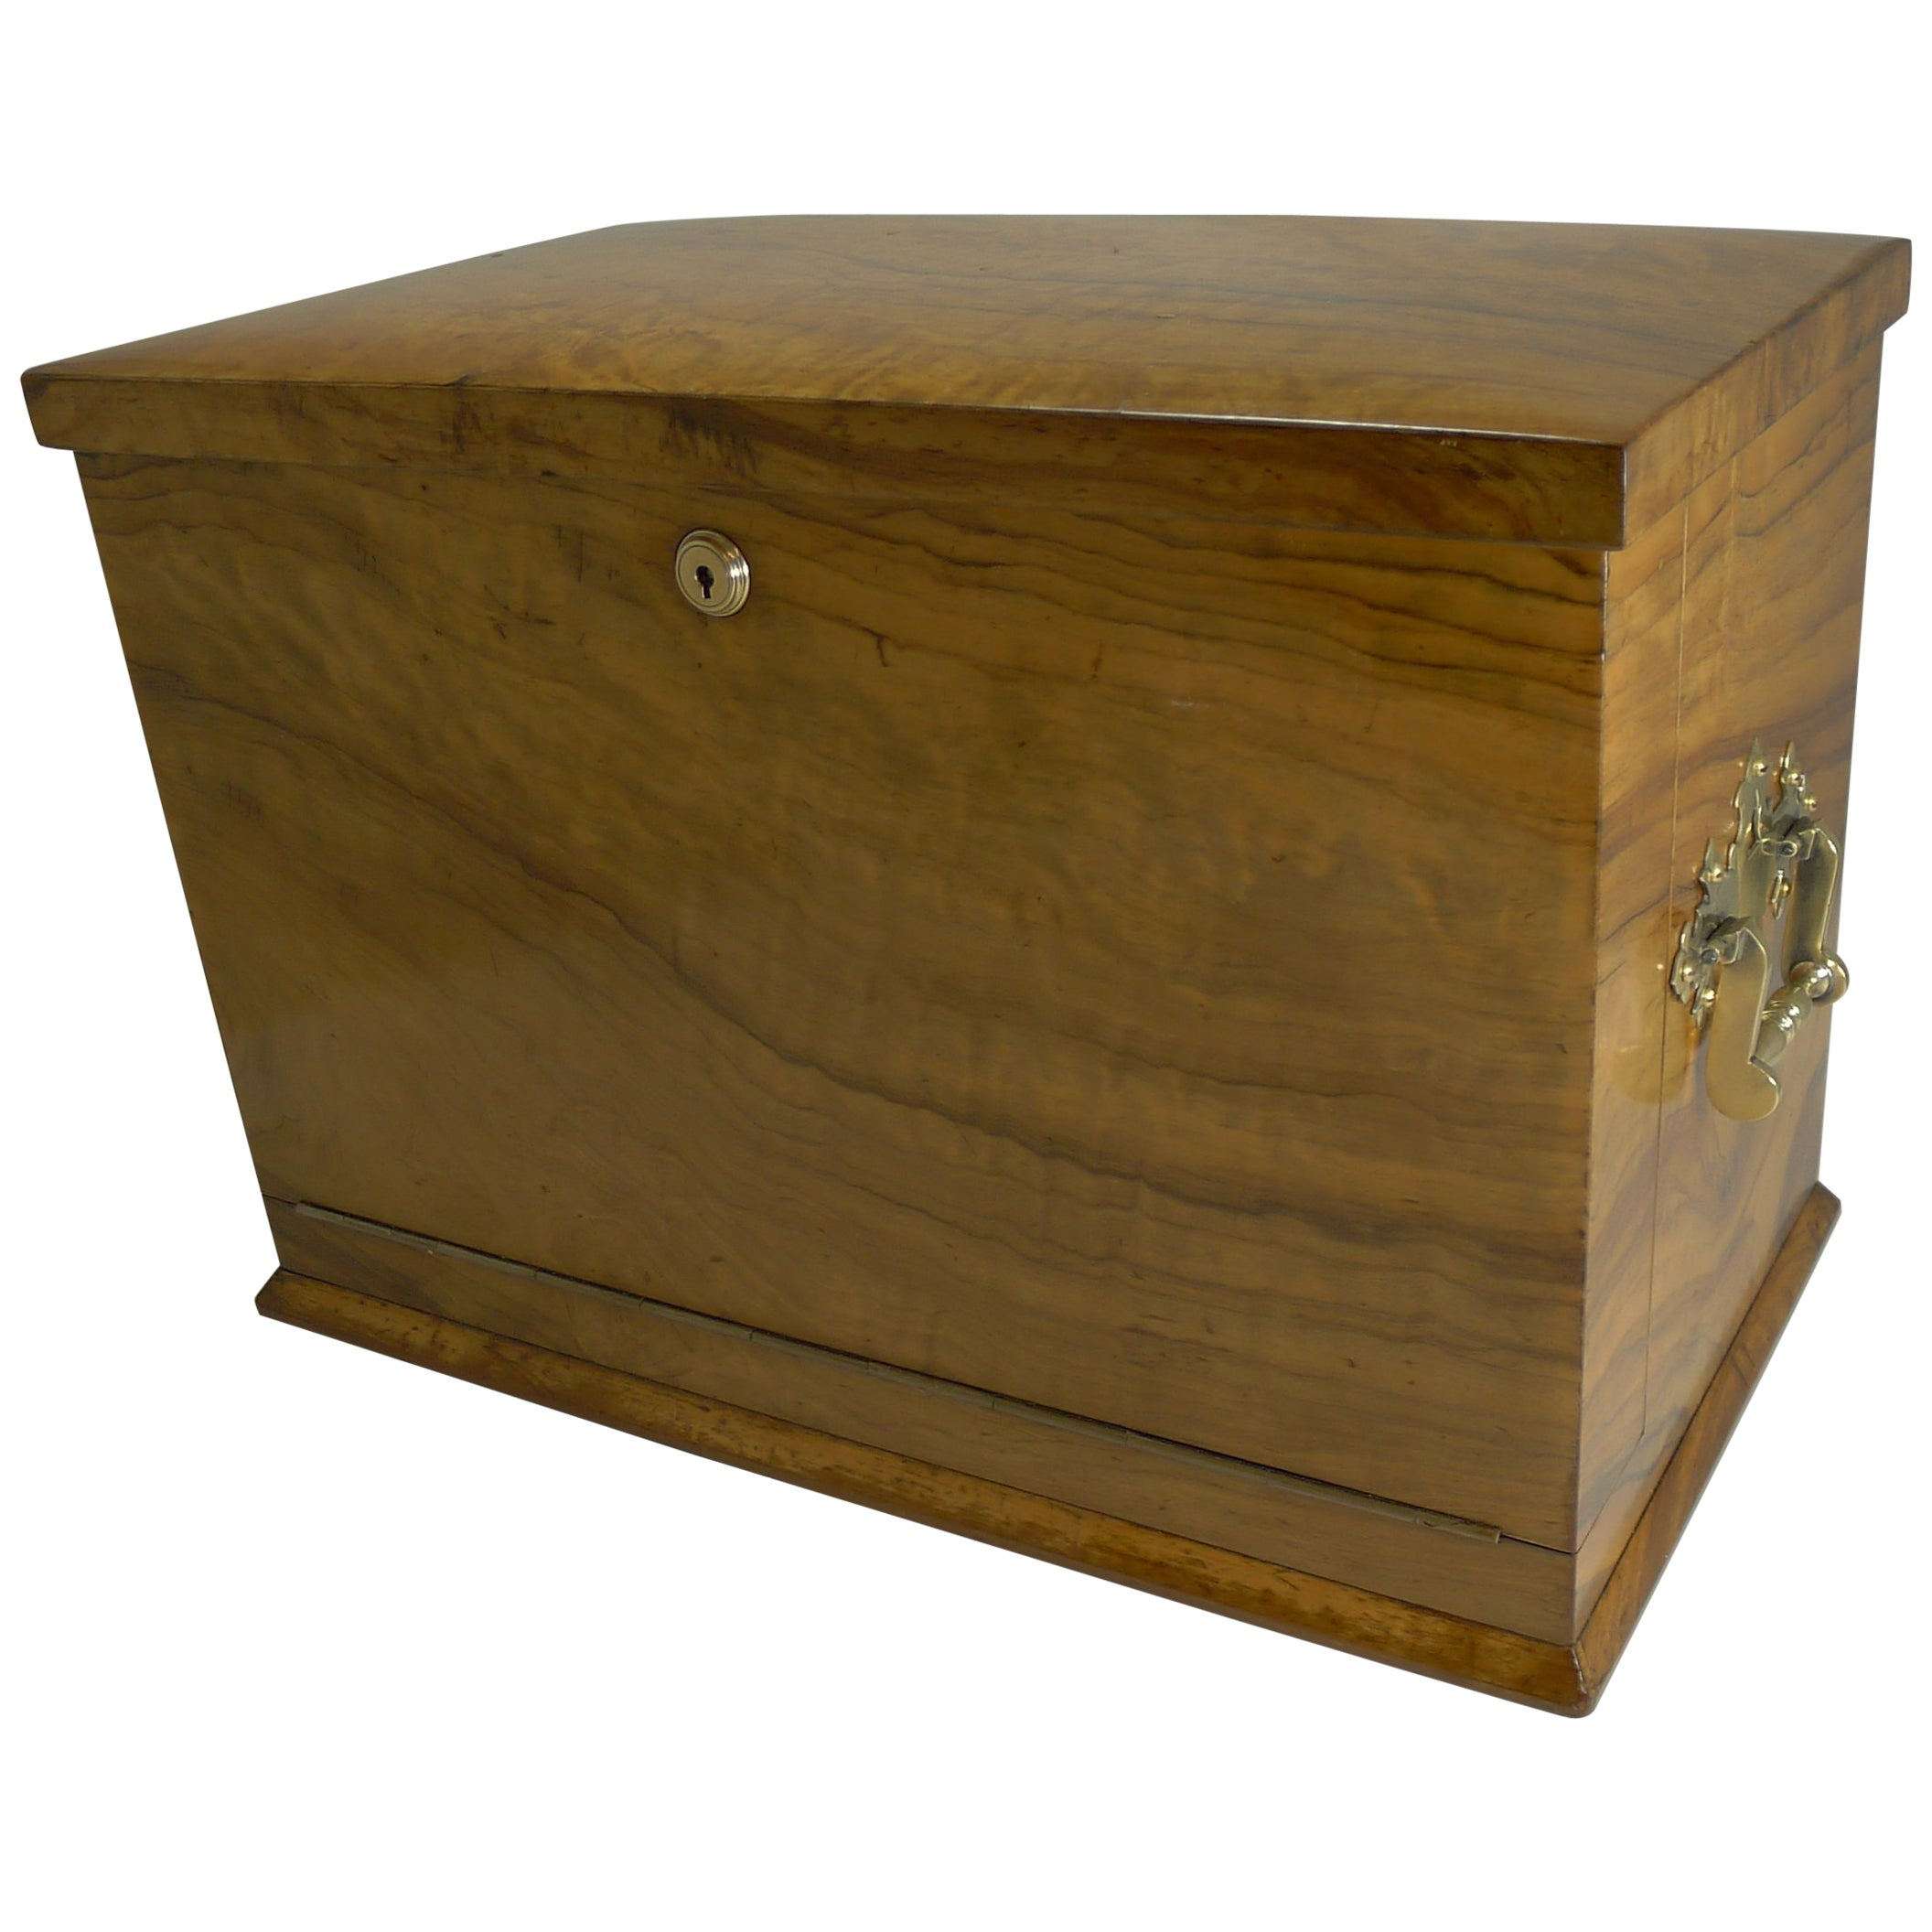 Grand Antique English Olivewood Writing Box / Cabinet, circa 1890